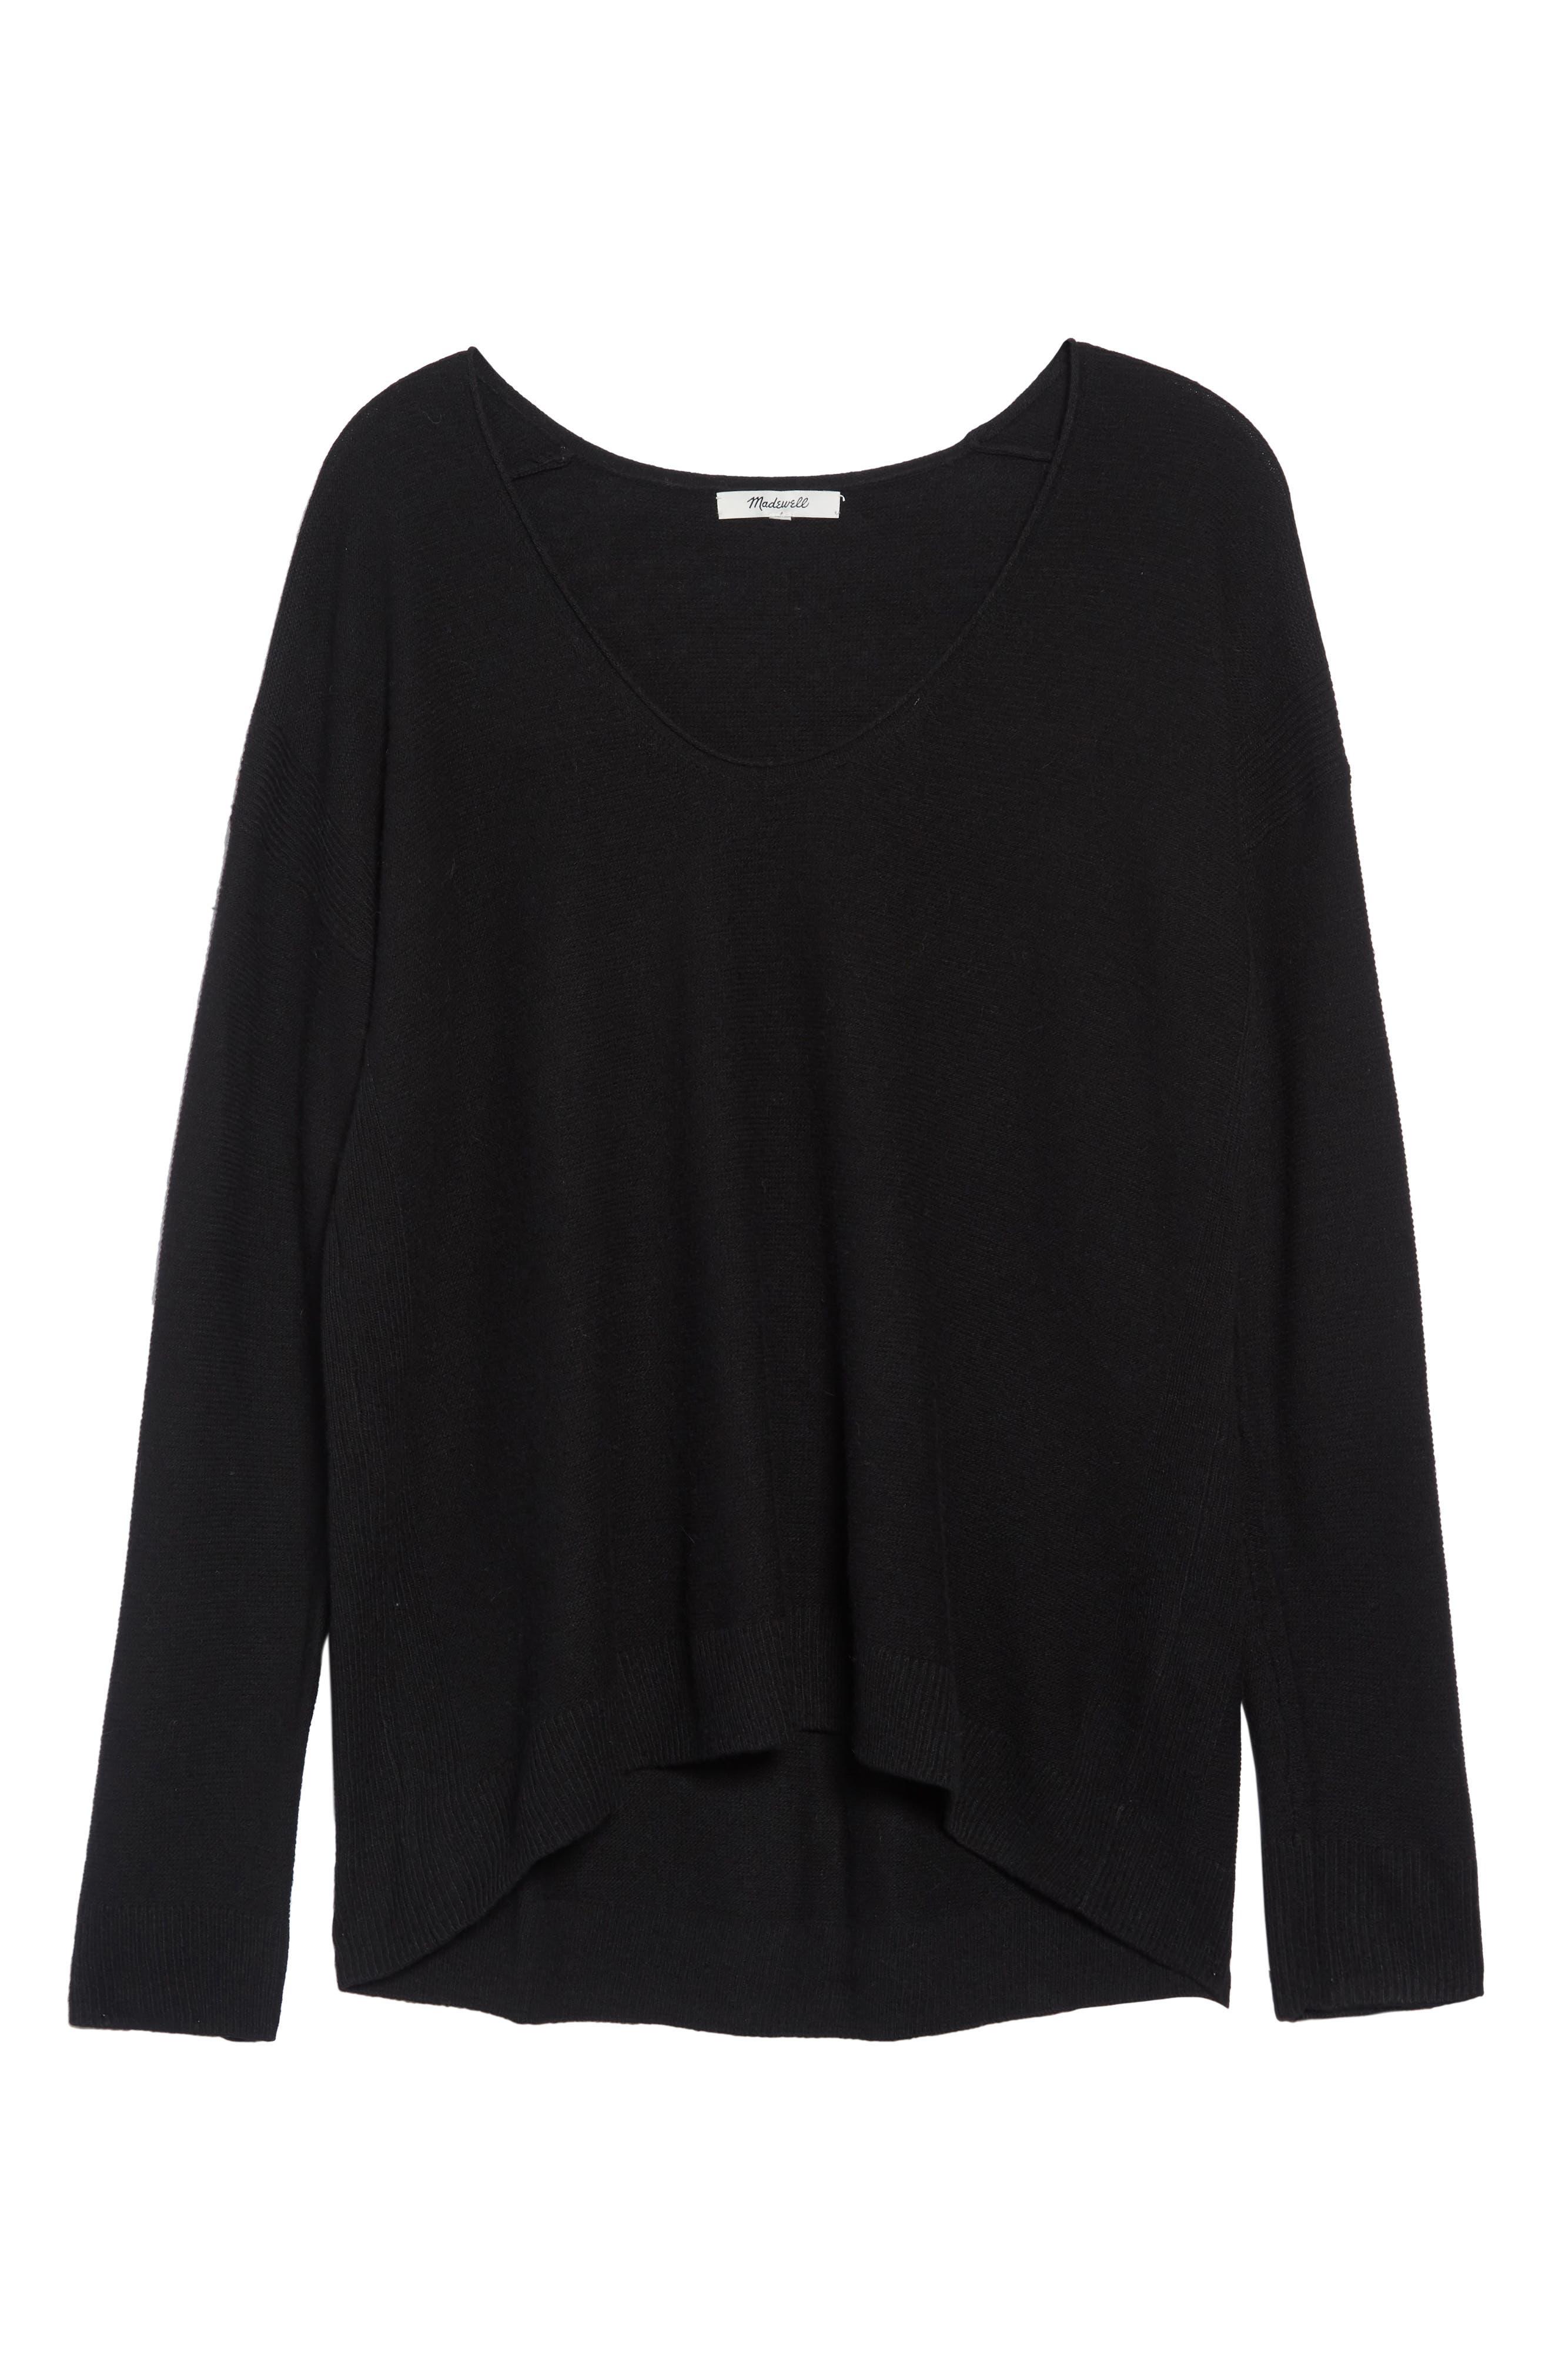 MADEWELL Kimball Sweater, Main, color, TRUE BLACK